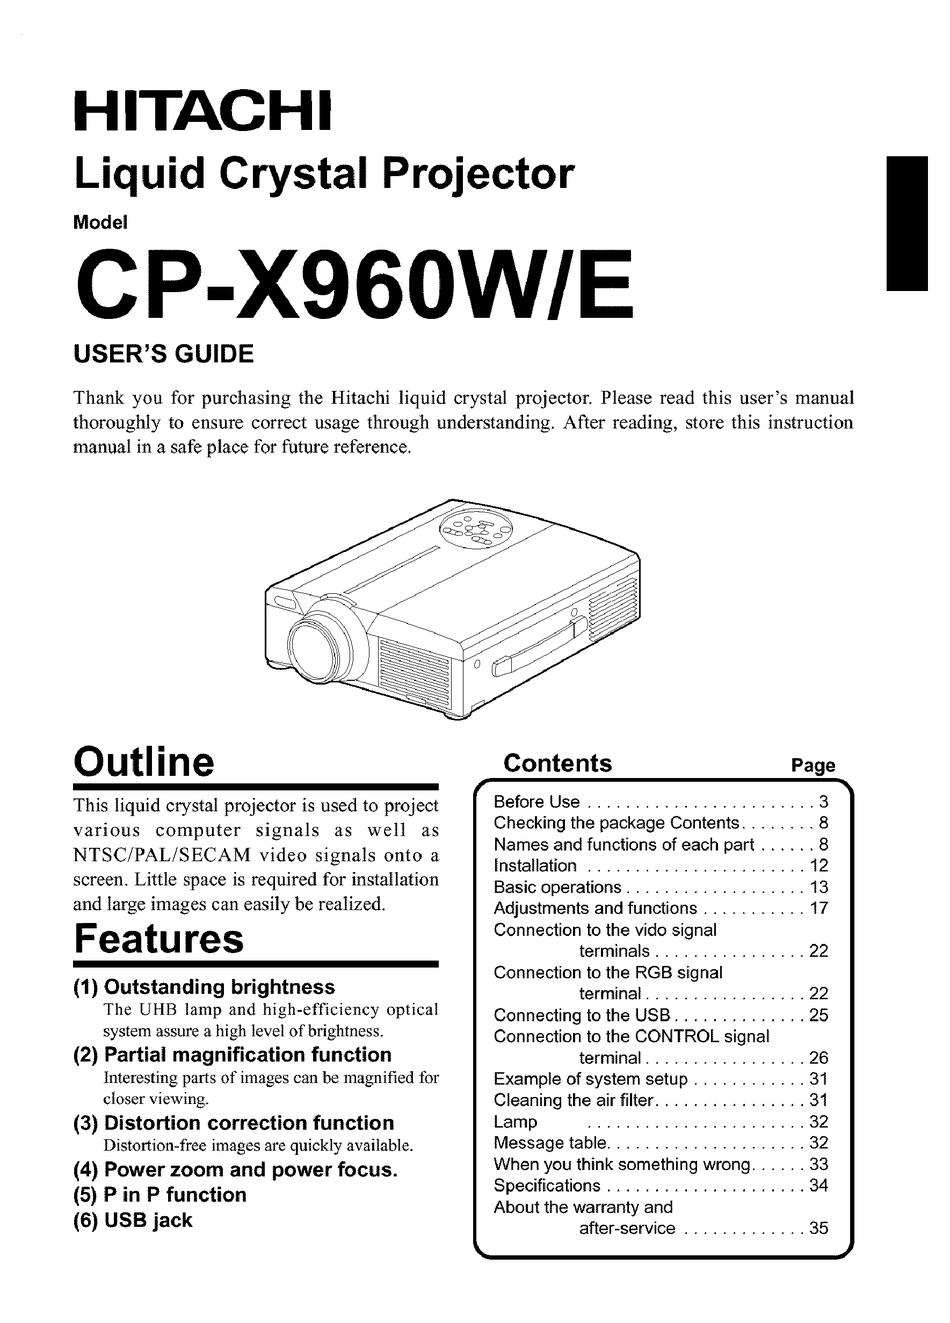 Remote Control for Hitachi CP-X958W/E Projector with Laser Pointer ...